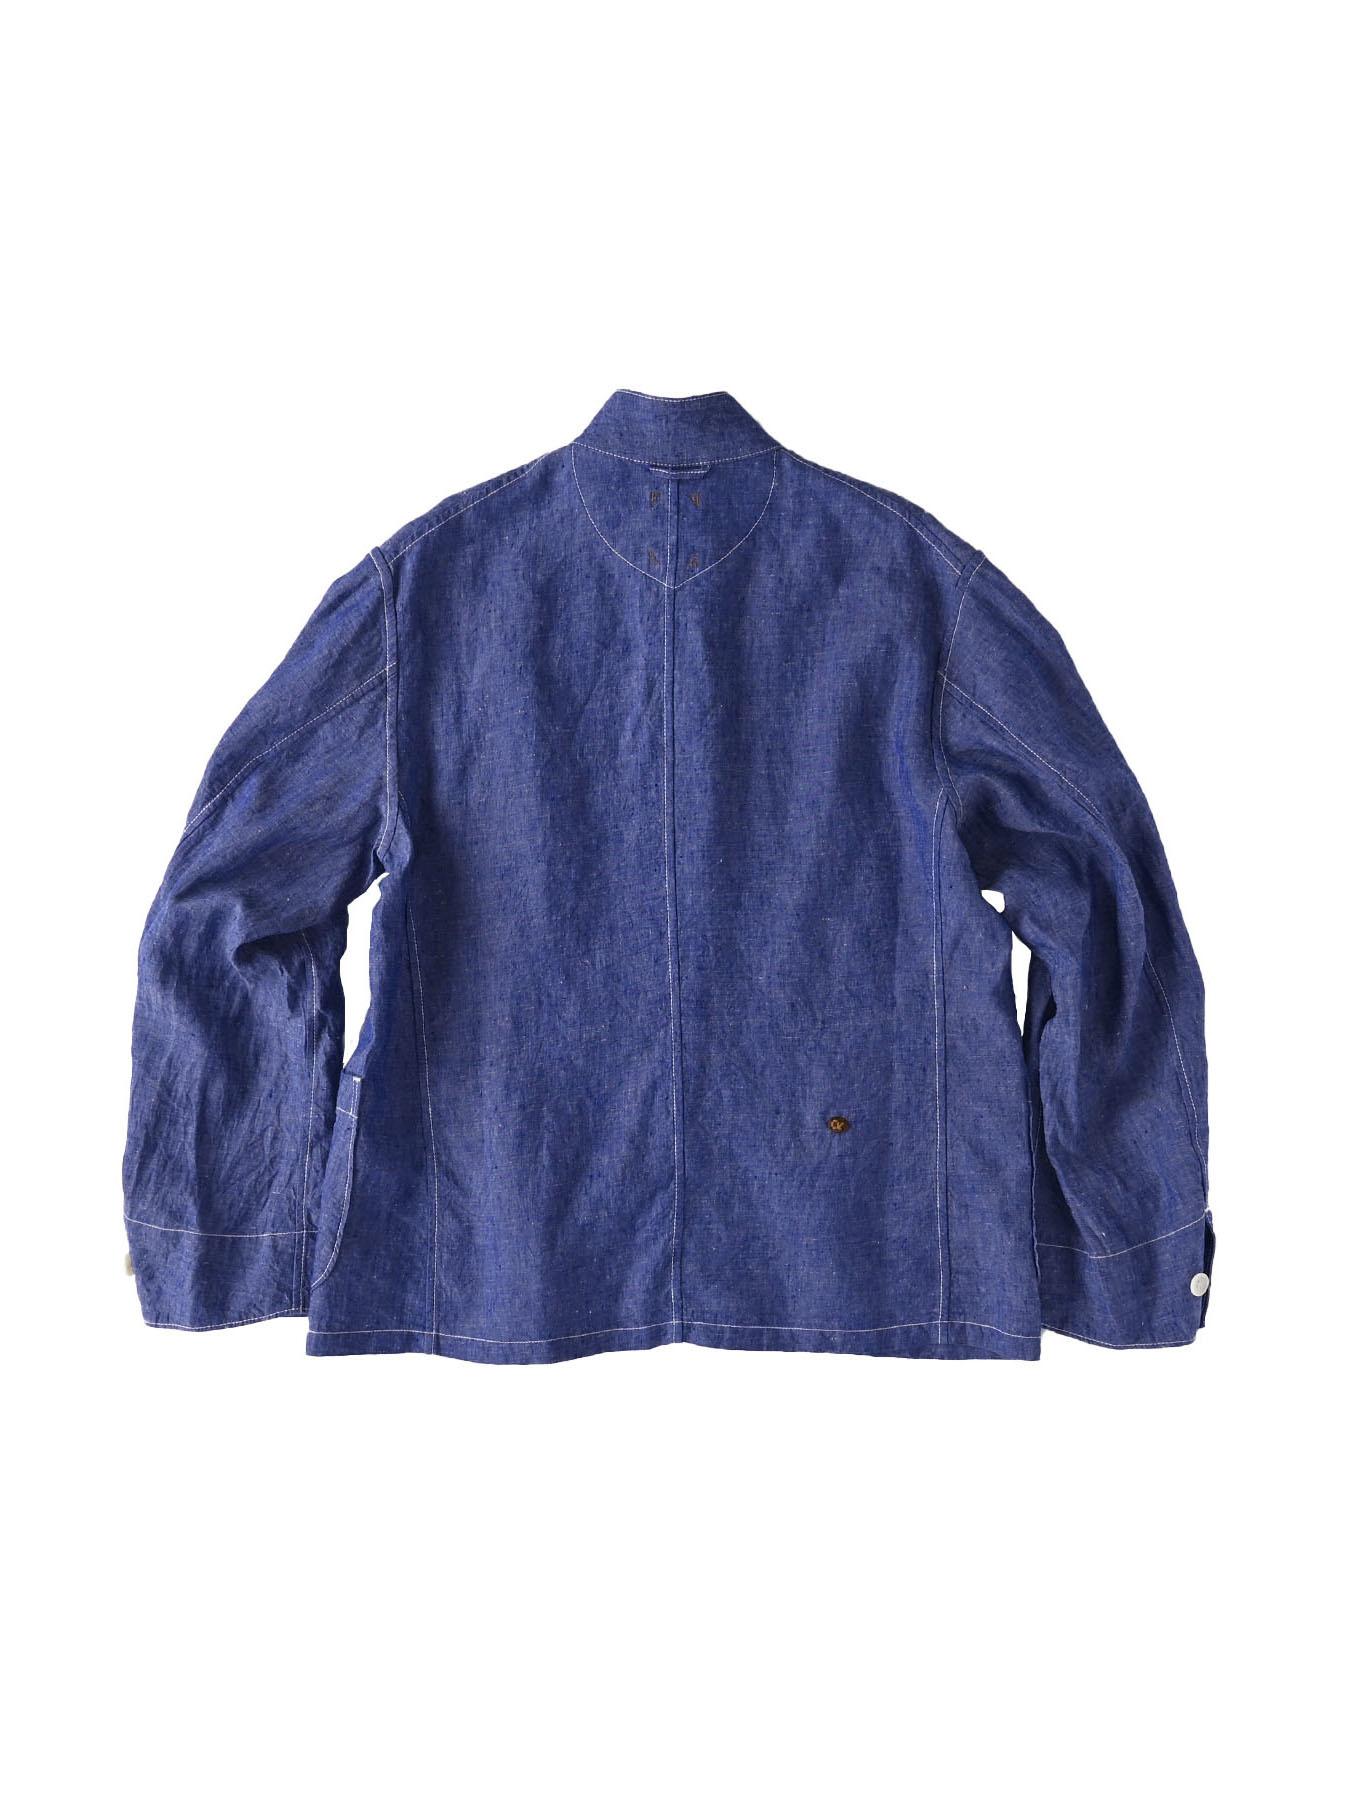 Indian Linen 908 Jacket (0521)-7